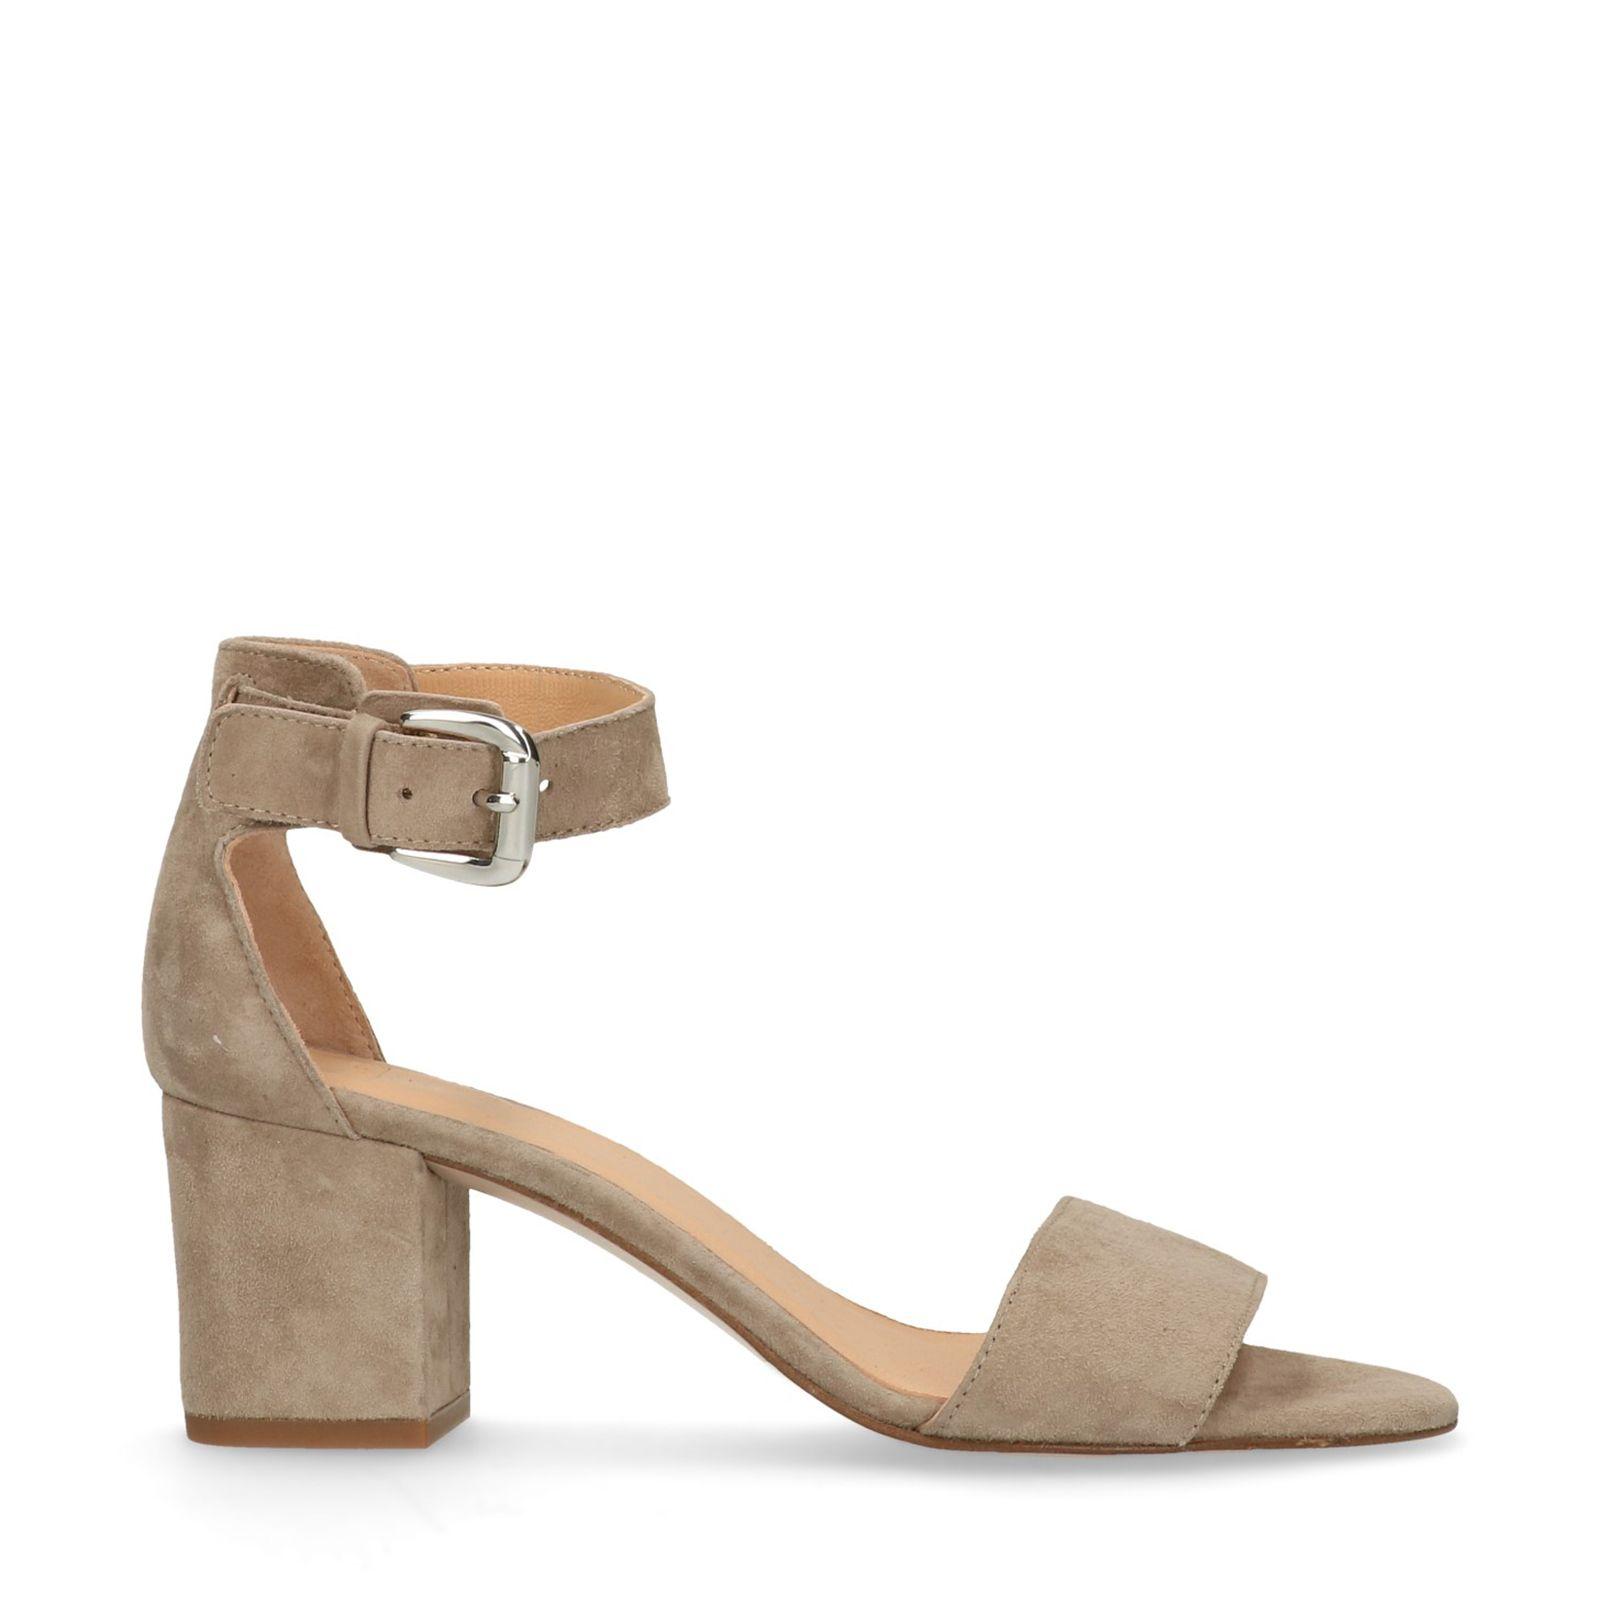 f012fc2a148149 Taupe sandalen met hak en open neus - Dames